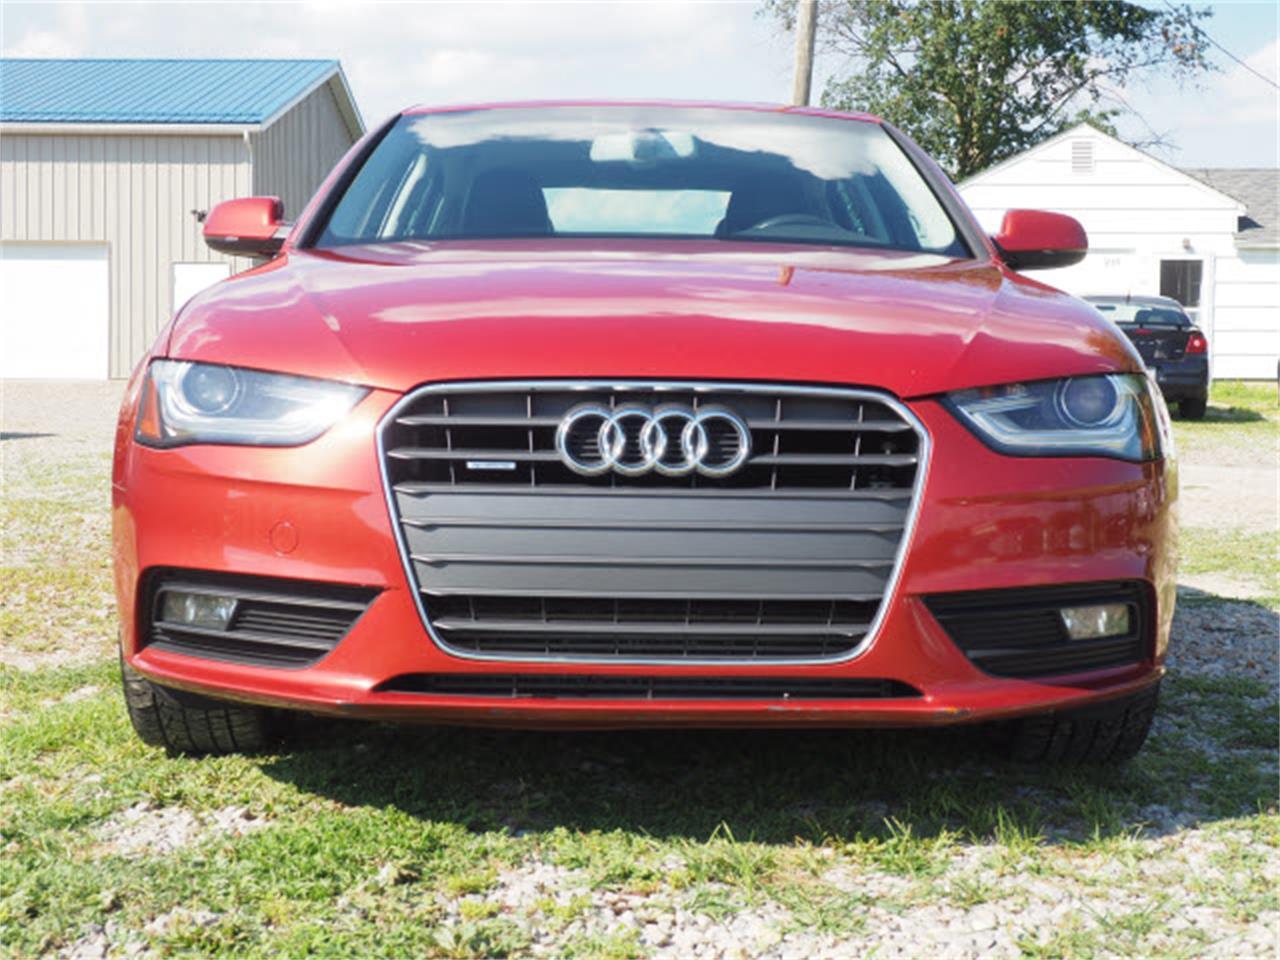 2013 Audi A4 (CC-1369414) for sale in Marysville, Ohio